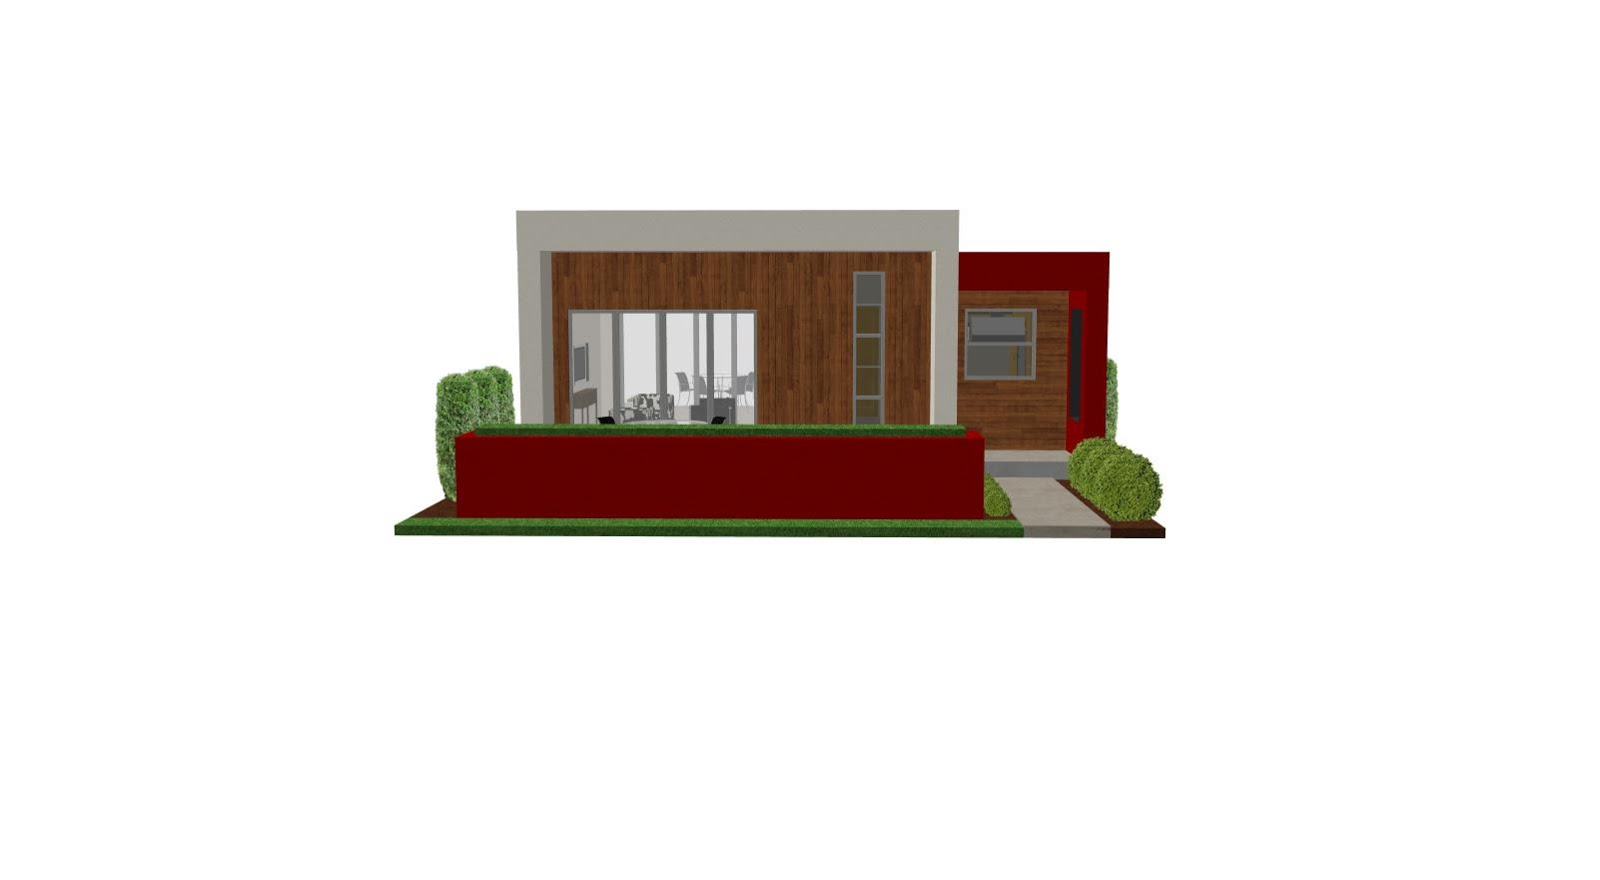 Descargar planos de casas y viviendas gratis fotos de for Casa moderna gratis